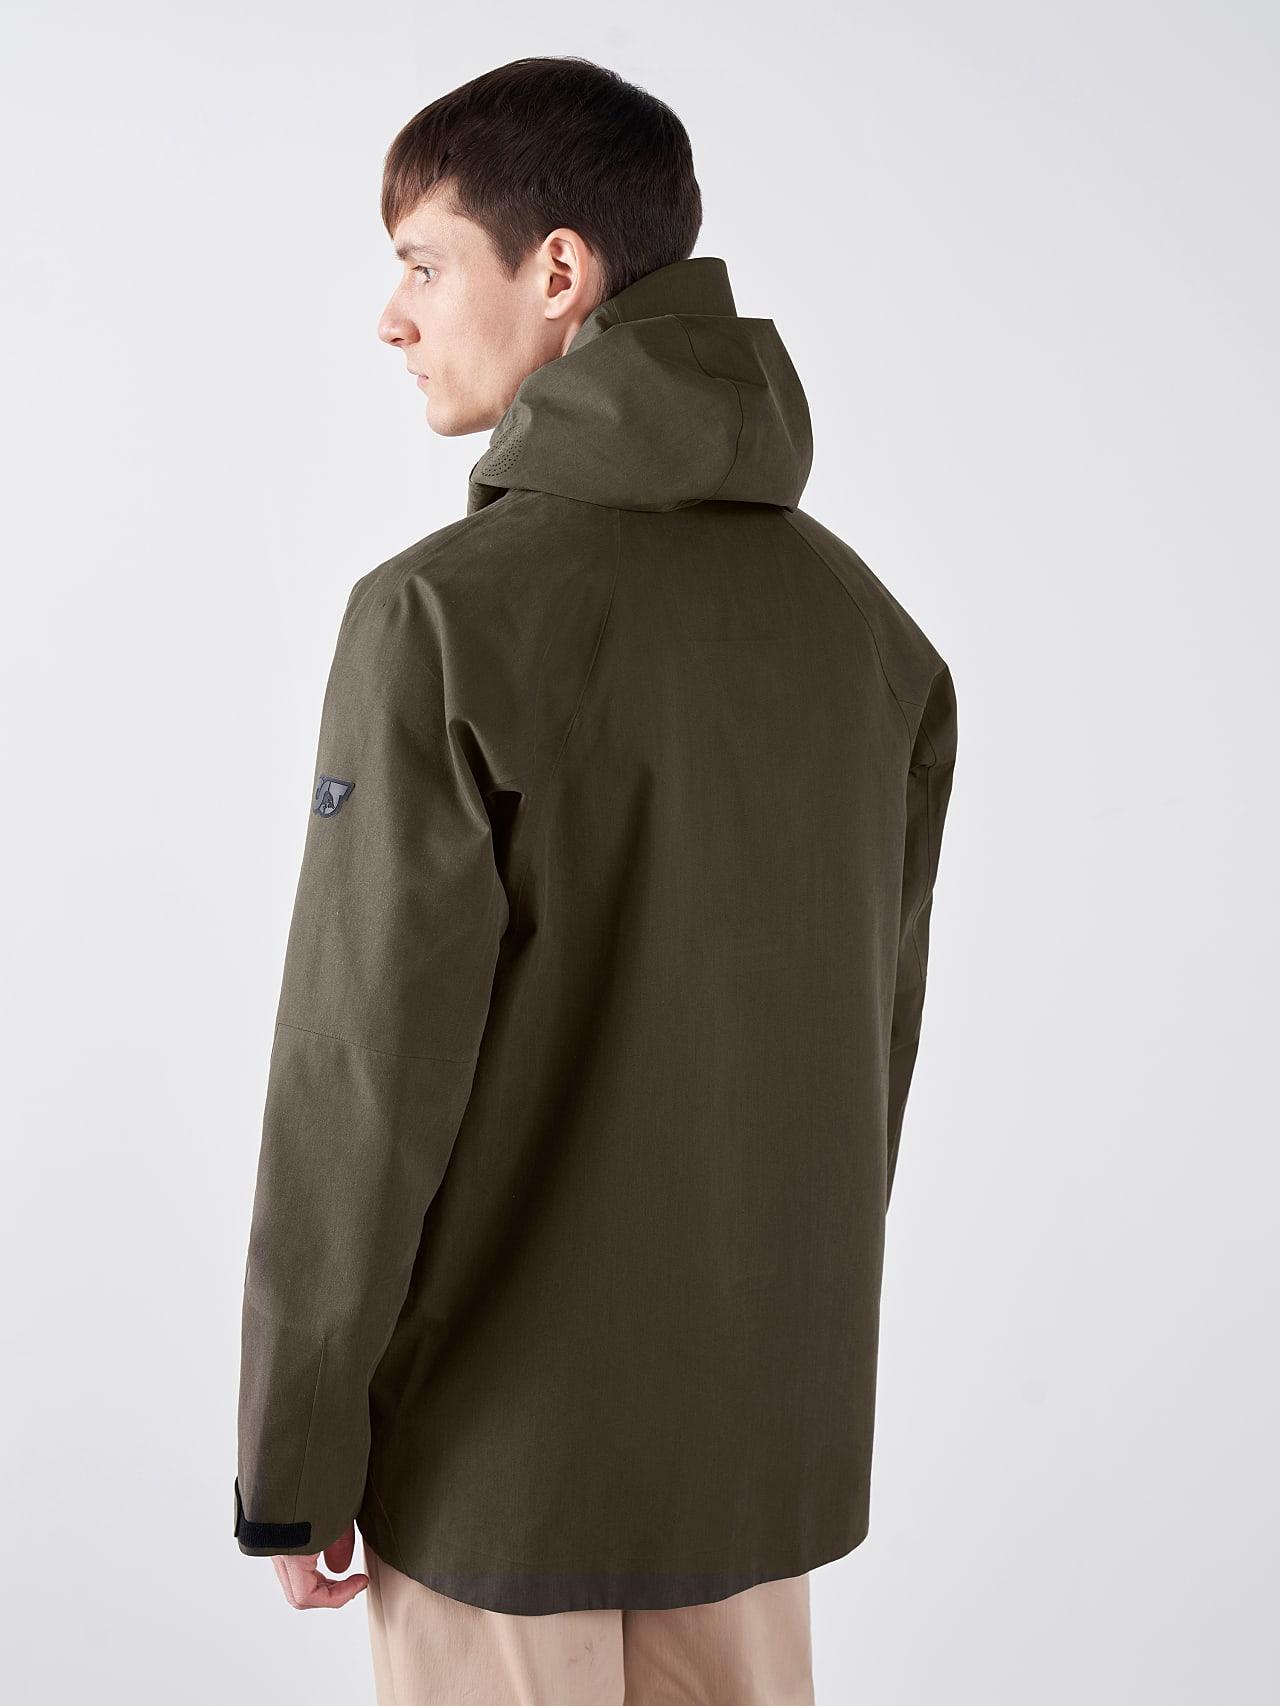 OKOVO V3.Y5.01 Packable Waterproof Jacket olive Front Main Alpha Tauri